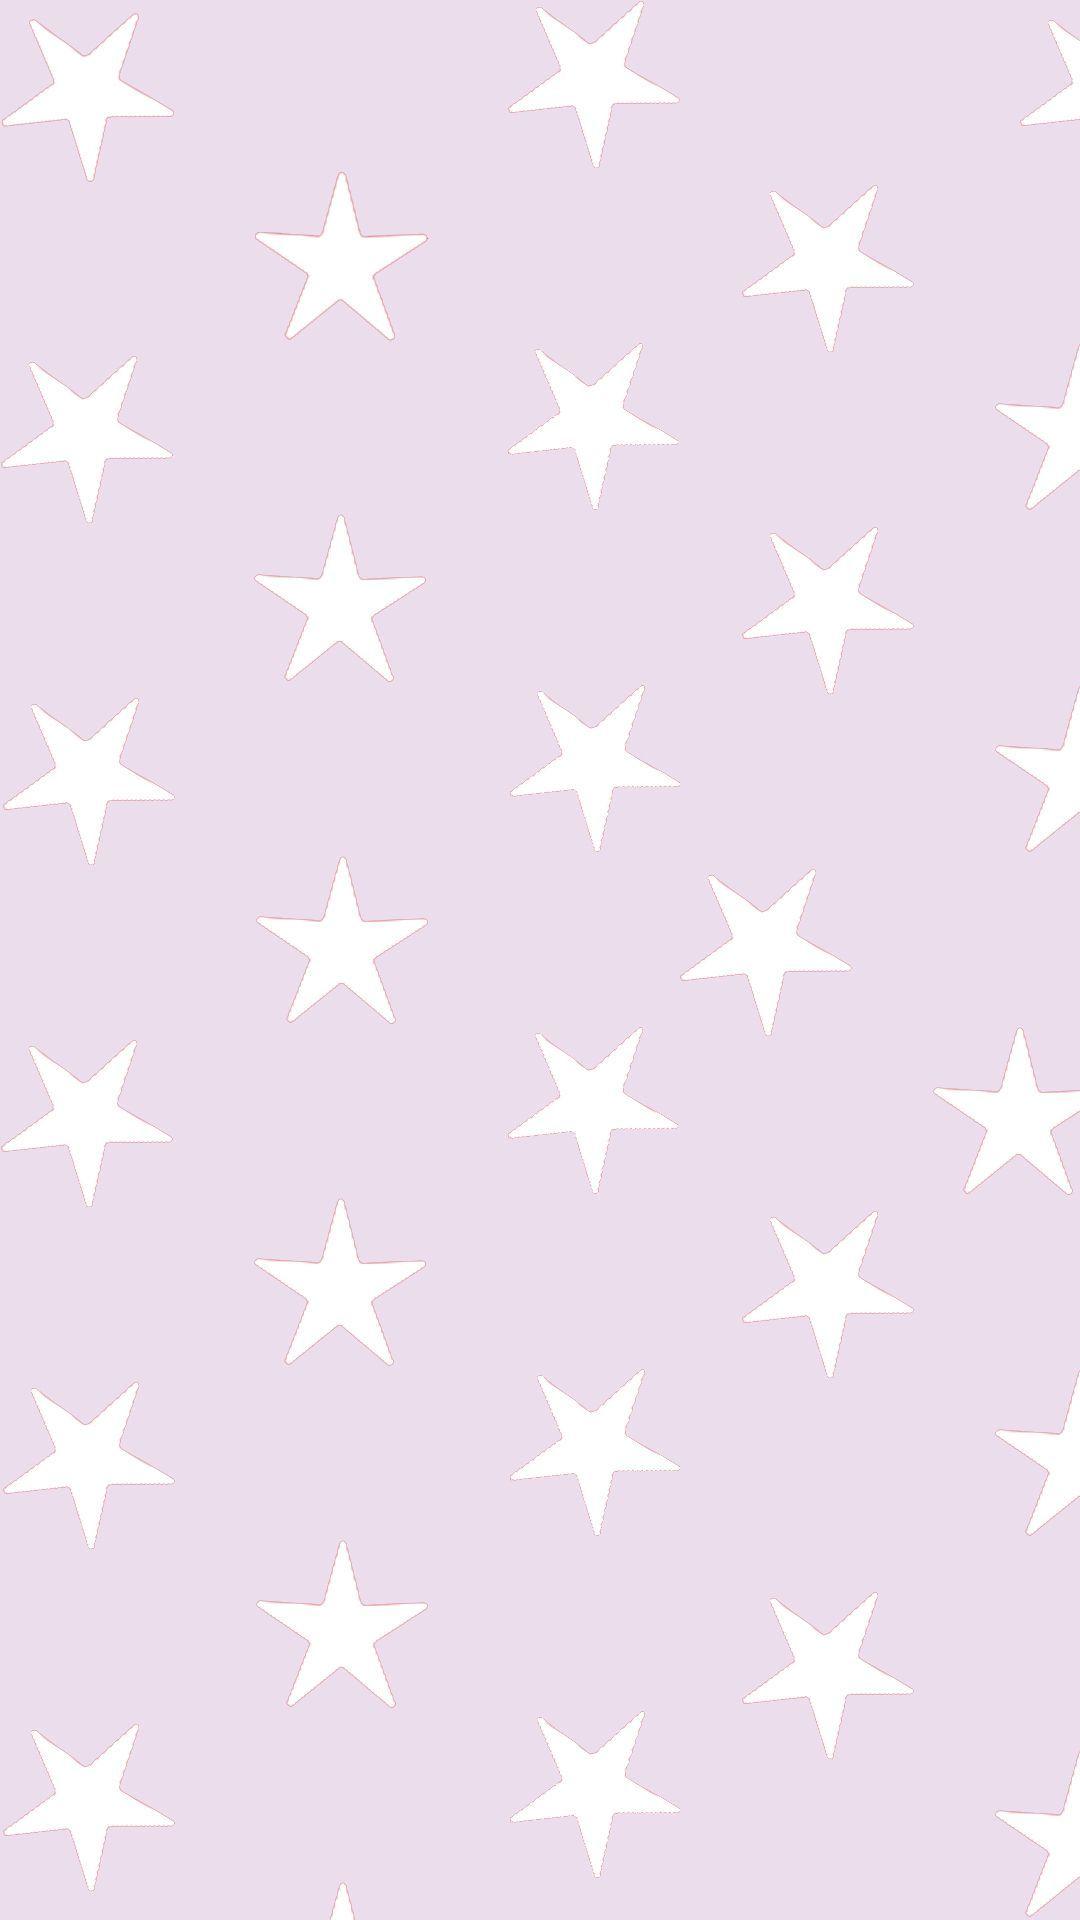 Glitter Sparkle Galaxy Sky Stars Shimmer Pink Purple Blue Cosmos Stardust Pastel Bokeh Cute Girly Star Wallpaper Art Wallpaper Cute Backgrounds